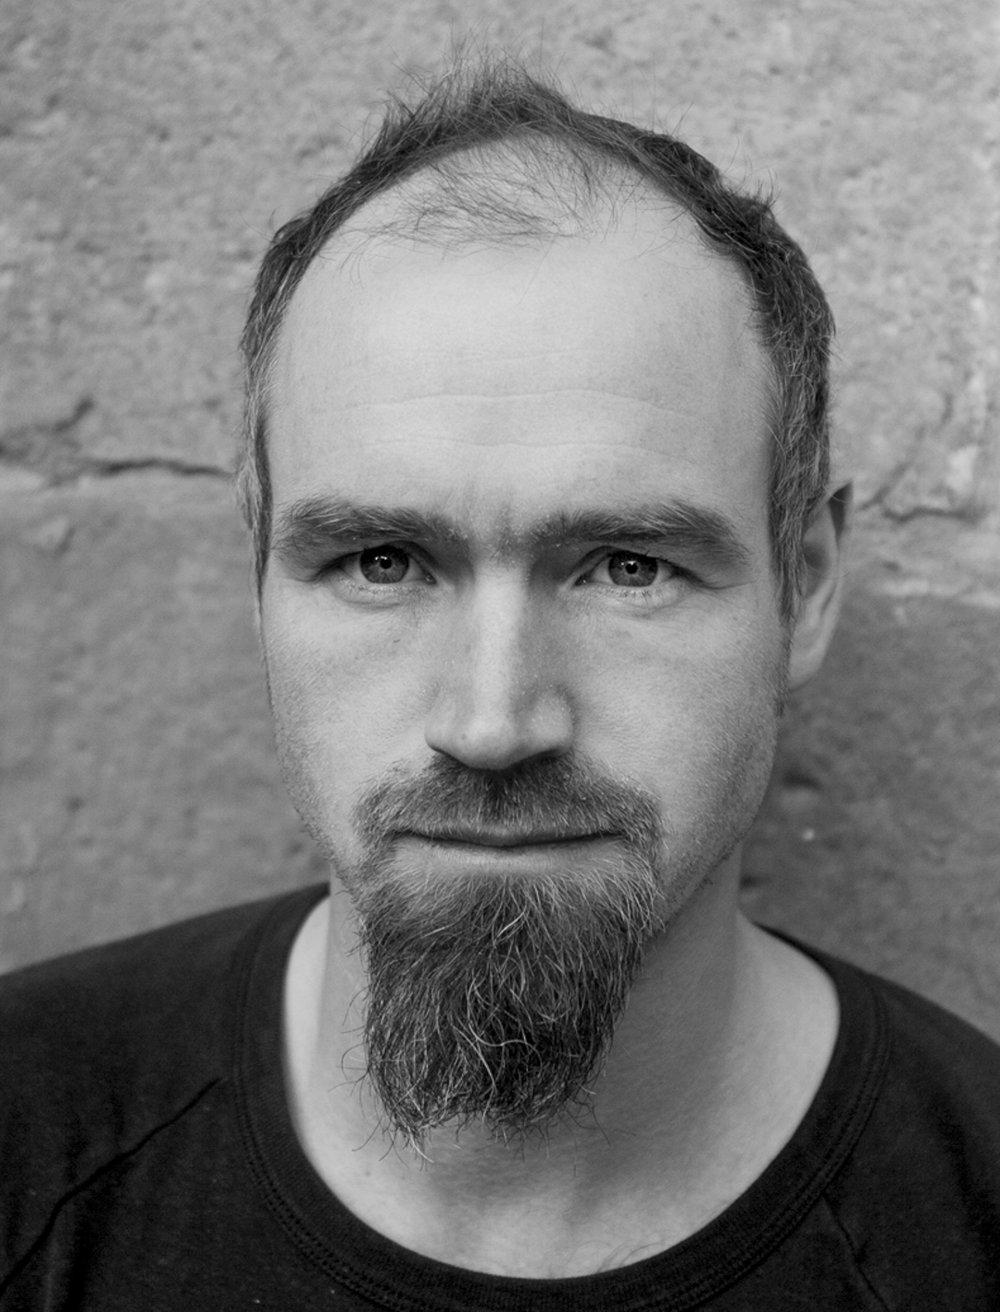 Sean O'Carroll